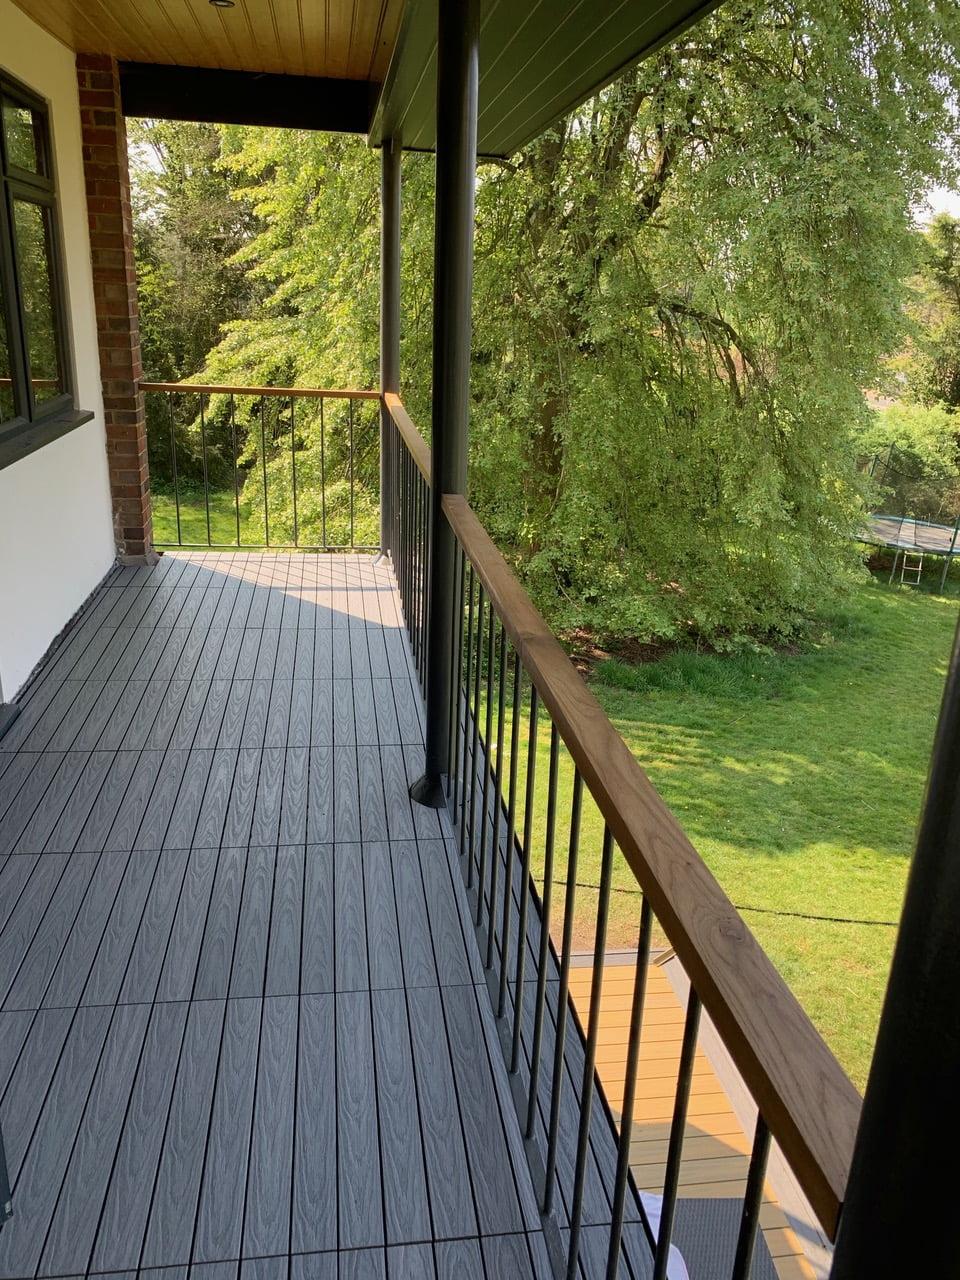 Silver Grey deck tiles on balcony